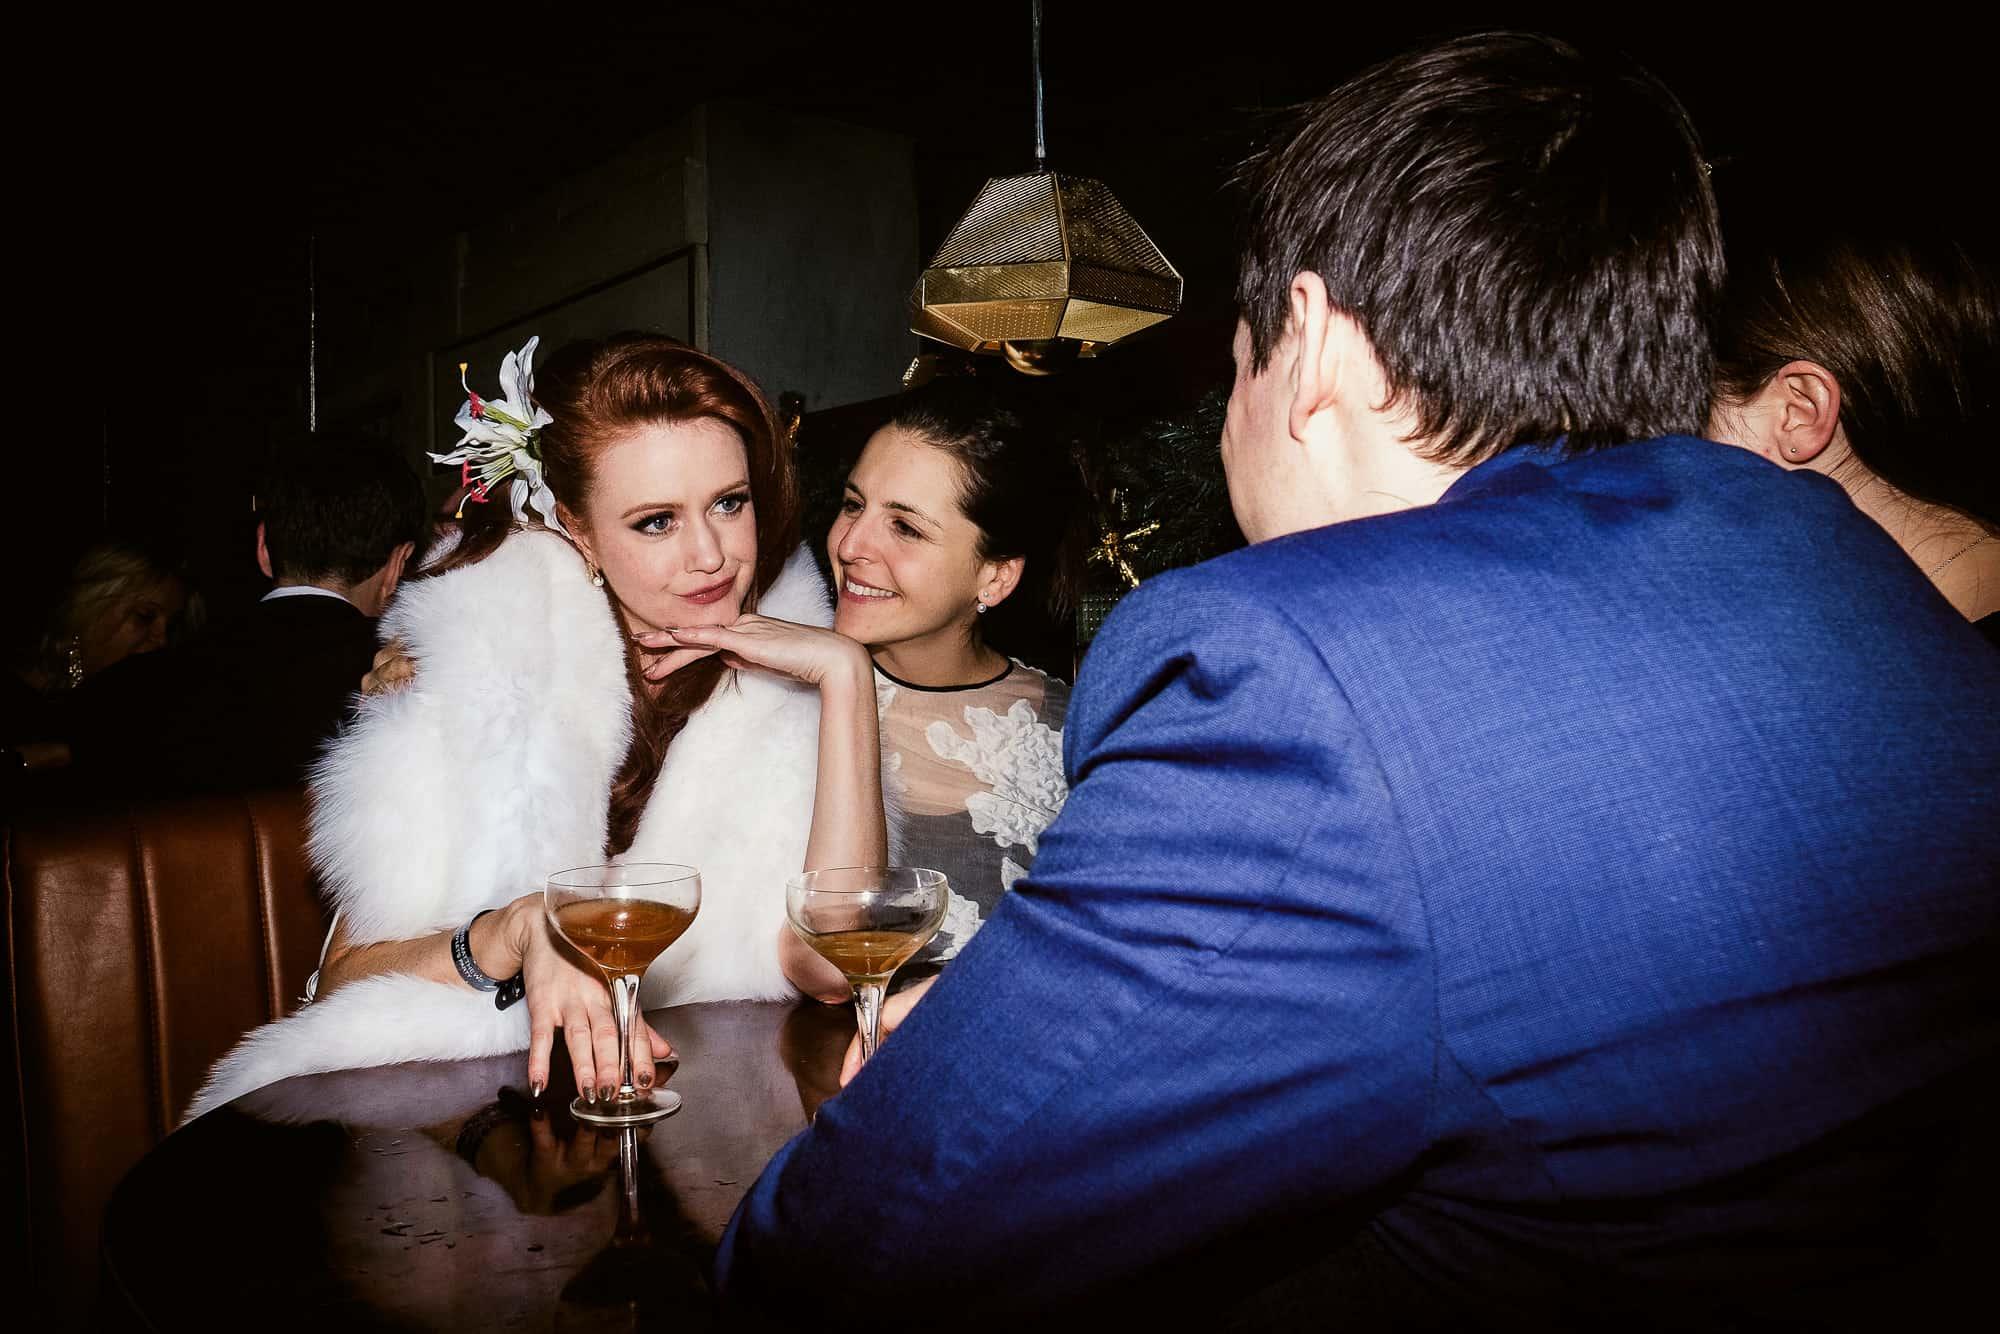 st-stephens-wedding-photographer-matt-tyler-0061